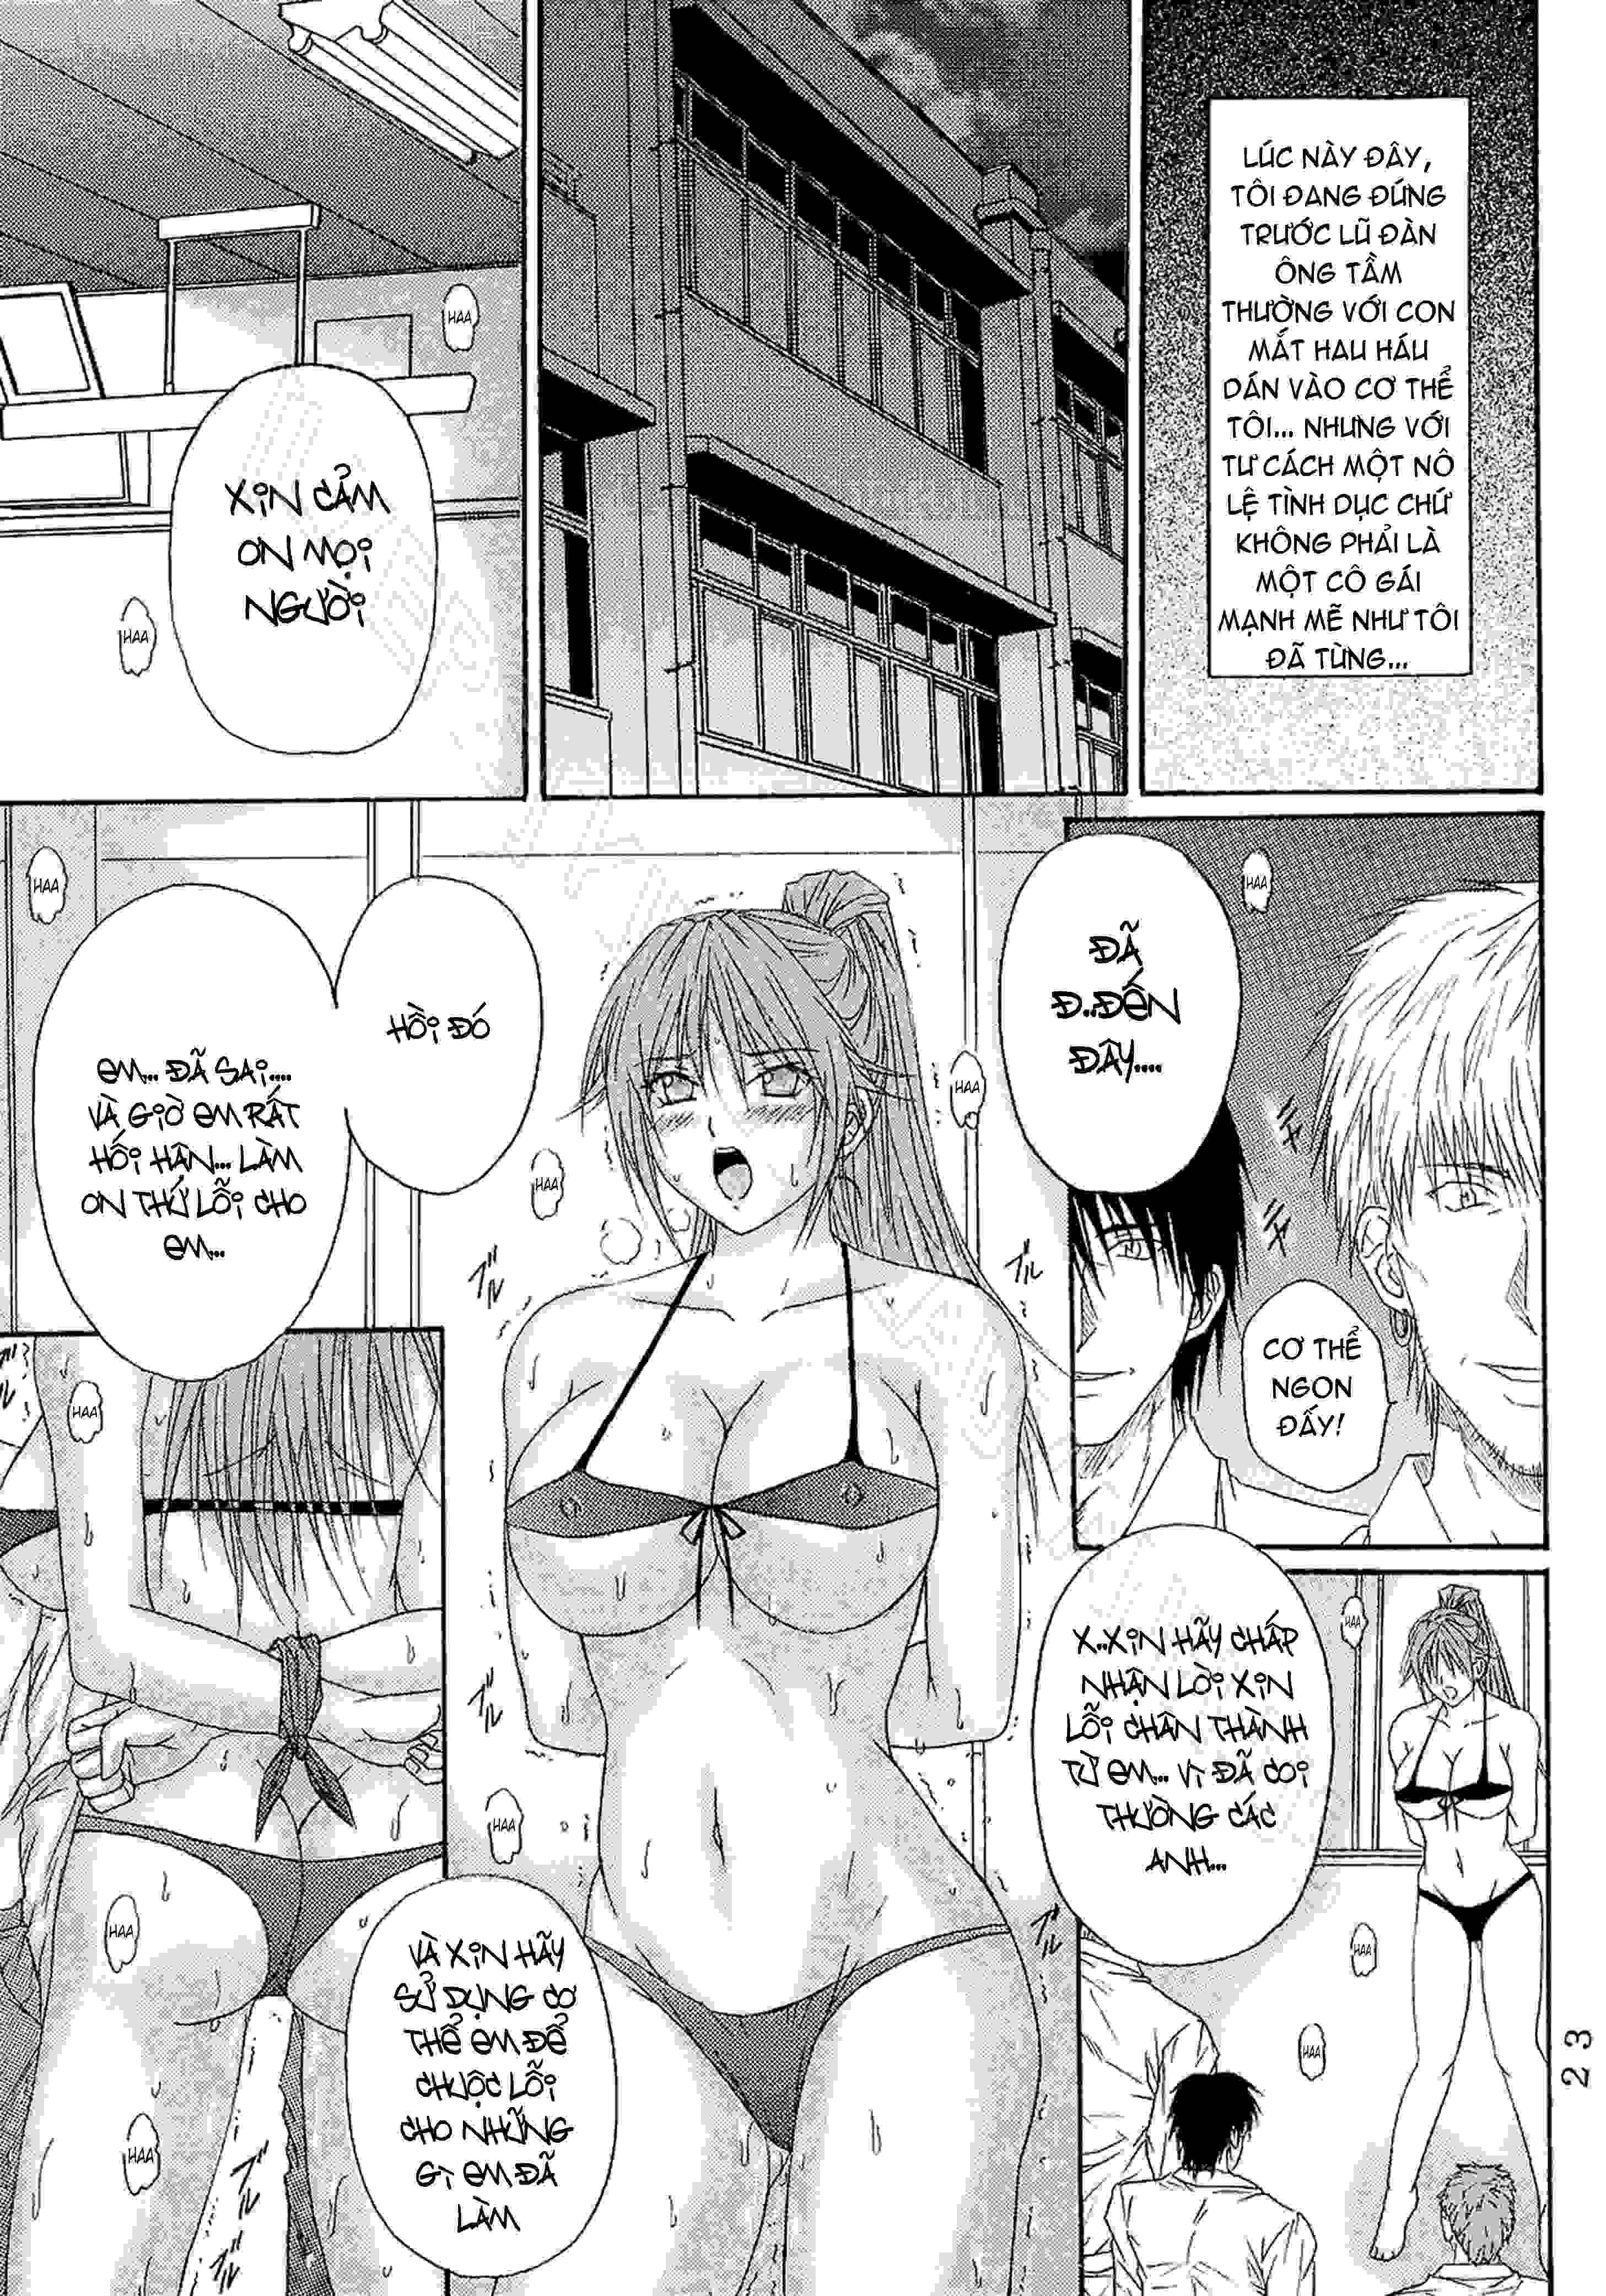 TruyenHay.Com - Ảnh 22 - Ryoujoku Rensa Chapter 6